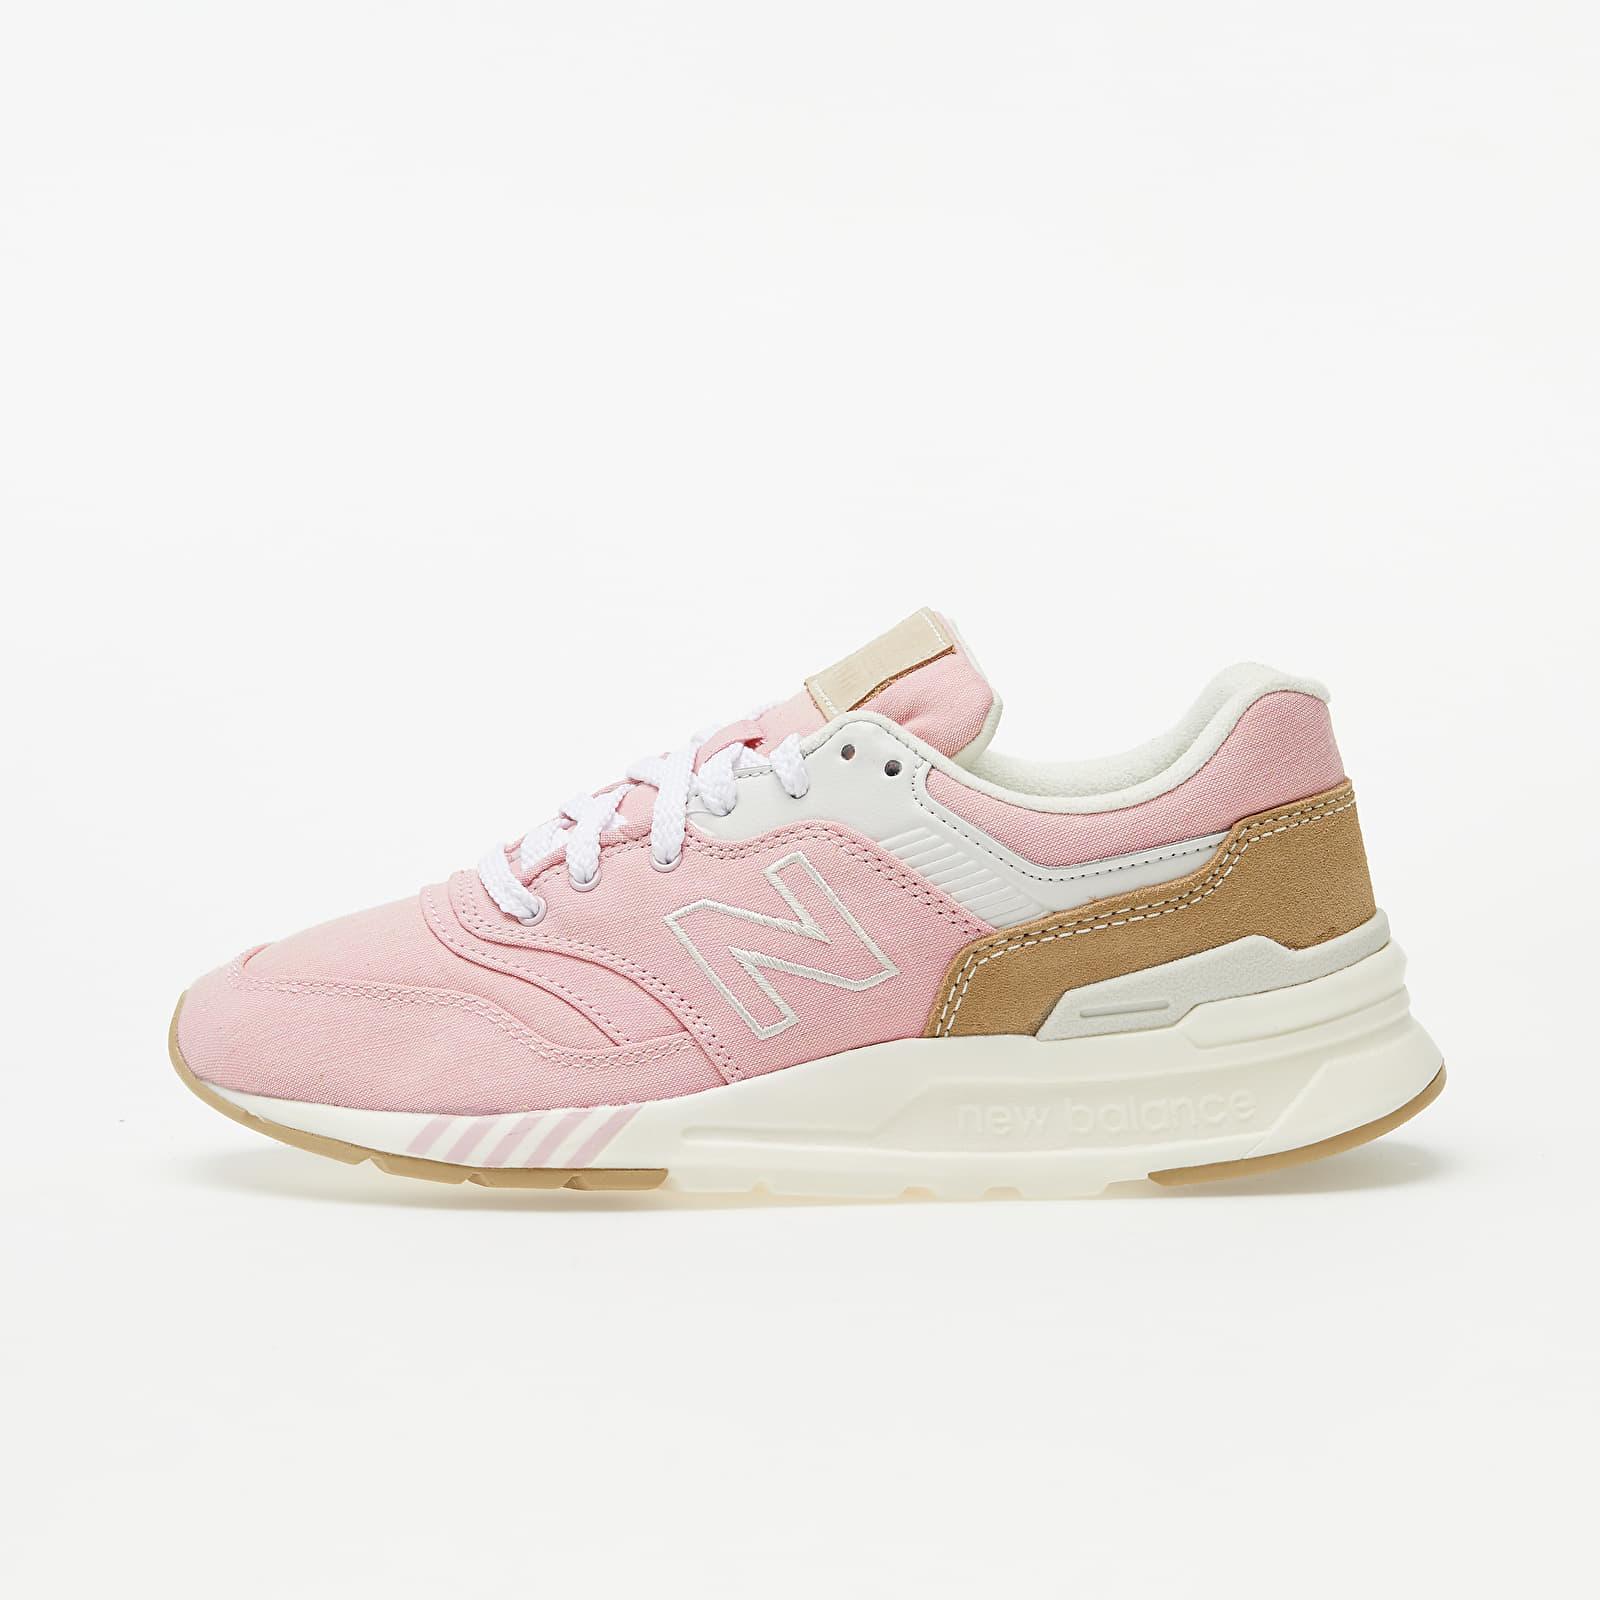 Frauen New Balance 997 Pink